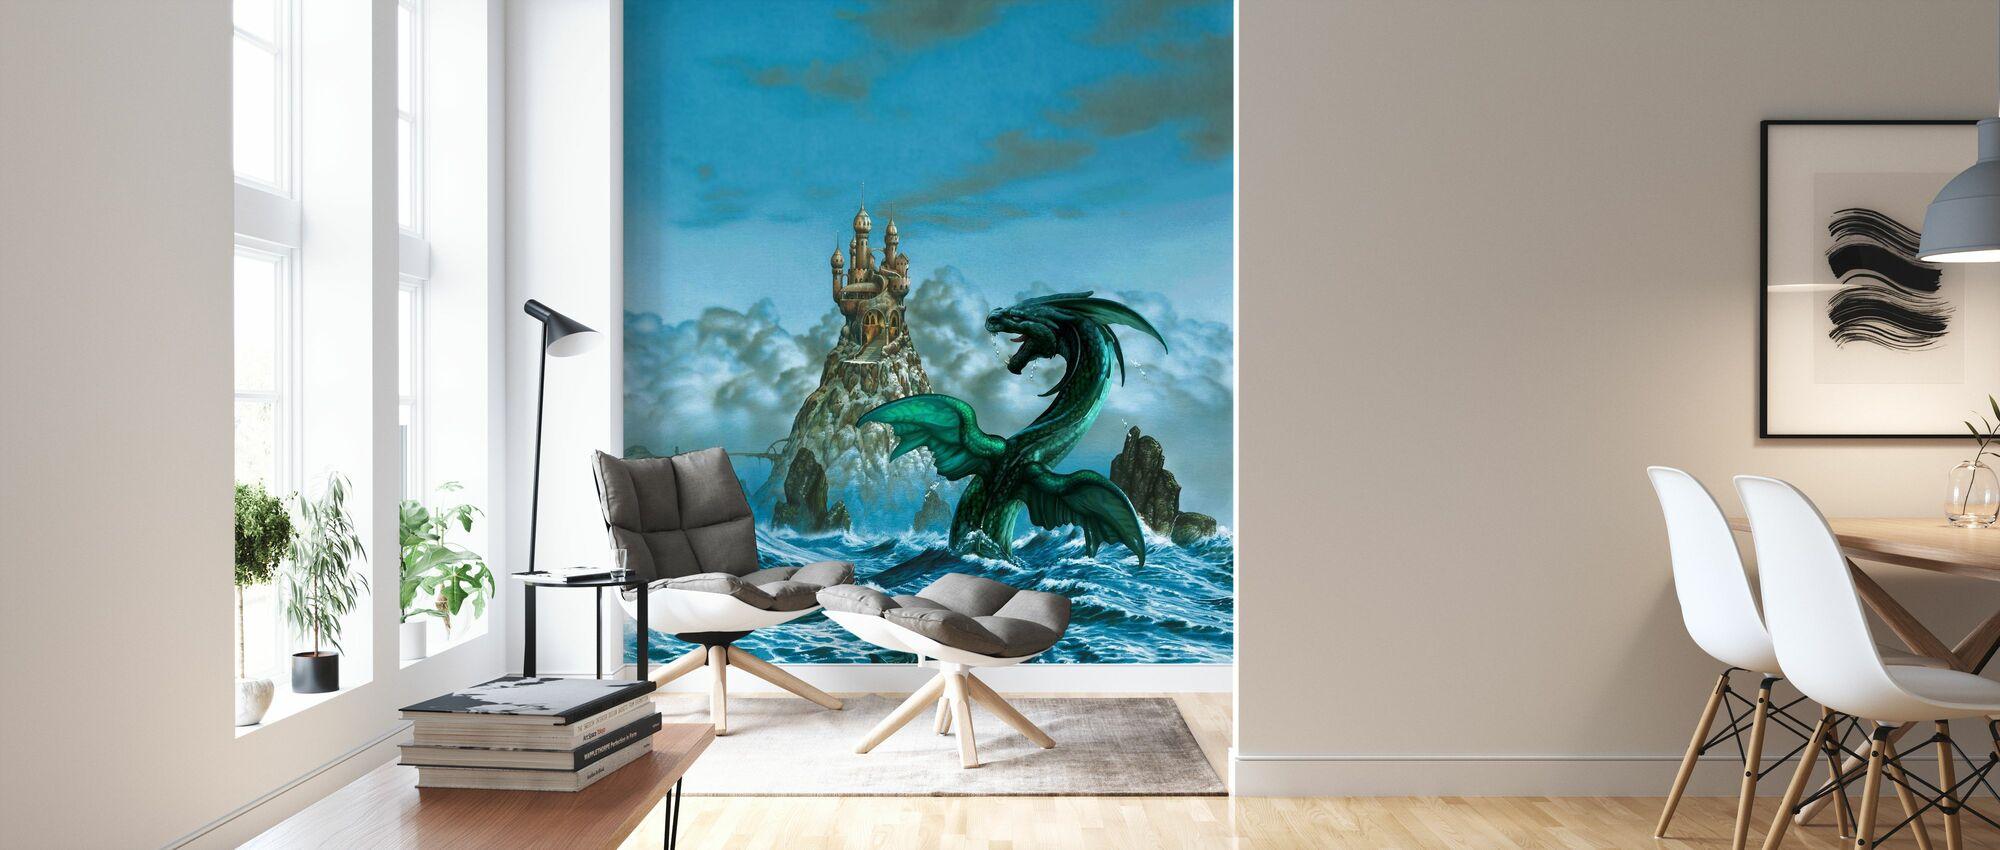 Dragon Mar - Wallpaper - Living Room